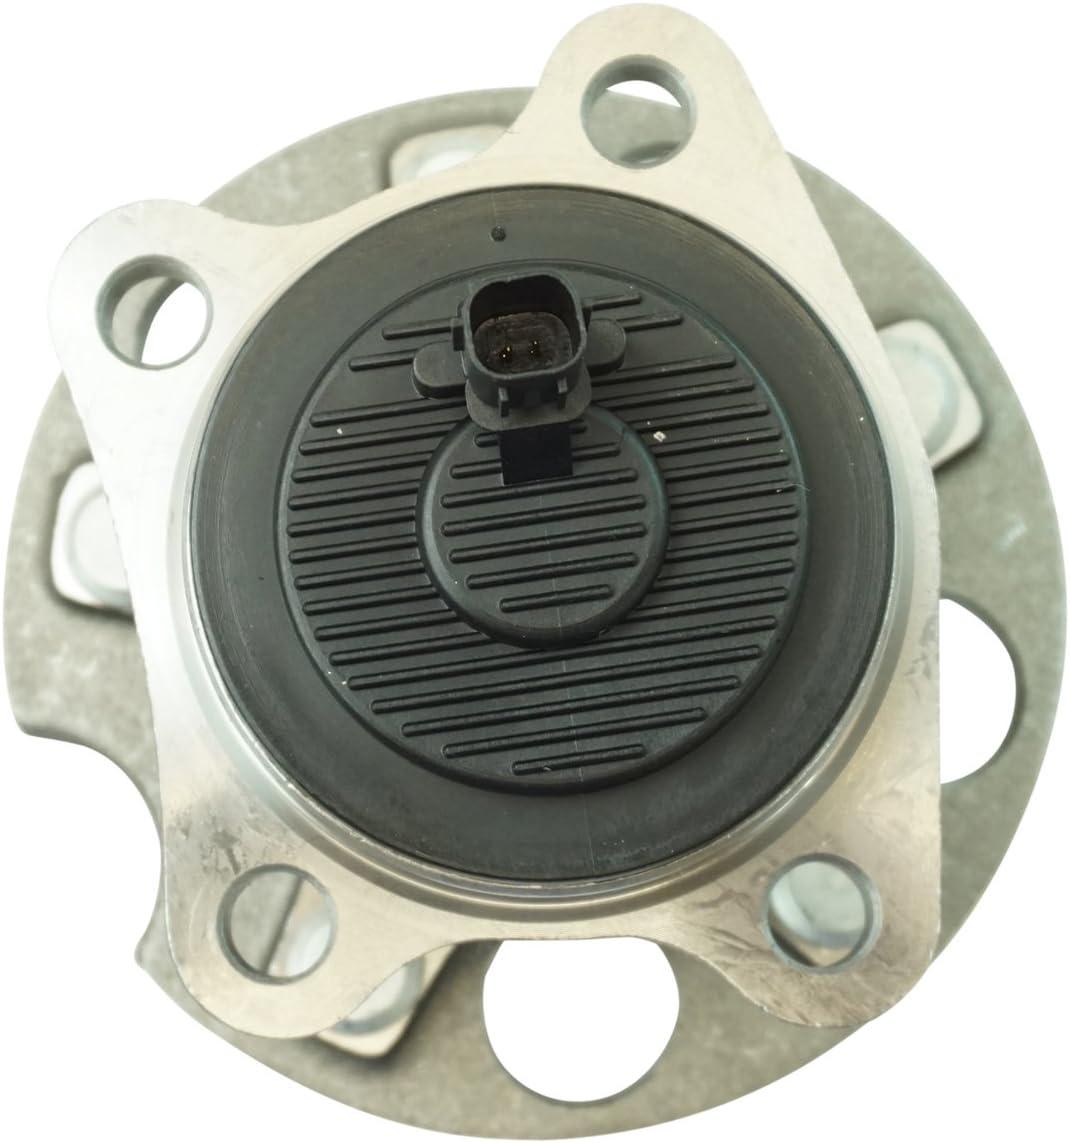 Rear Wheel Bearing /& Hub Assembly LH RH Pair for 09-15 Toyota Venza SUV